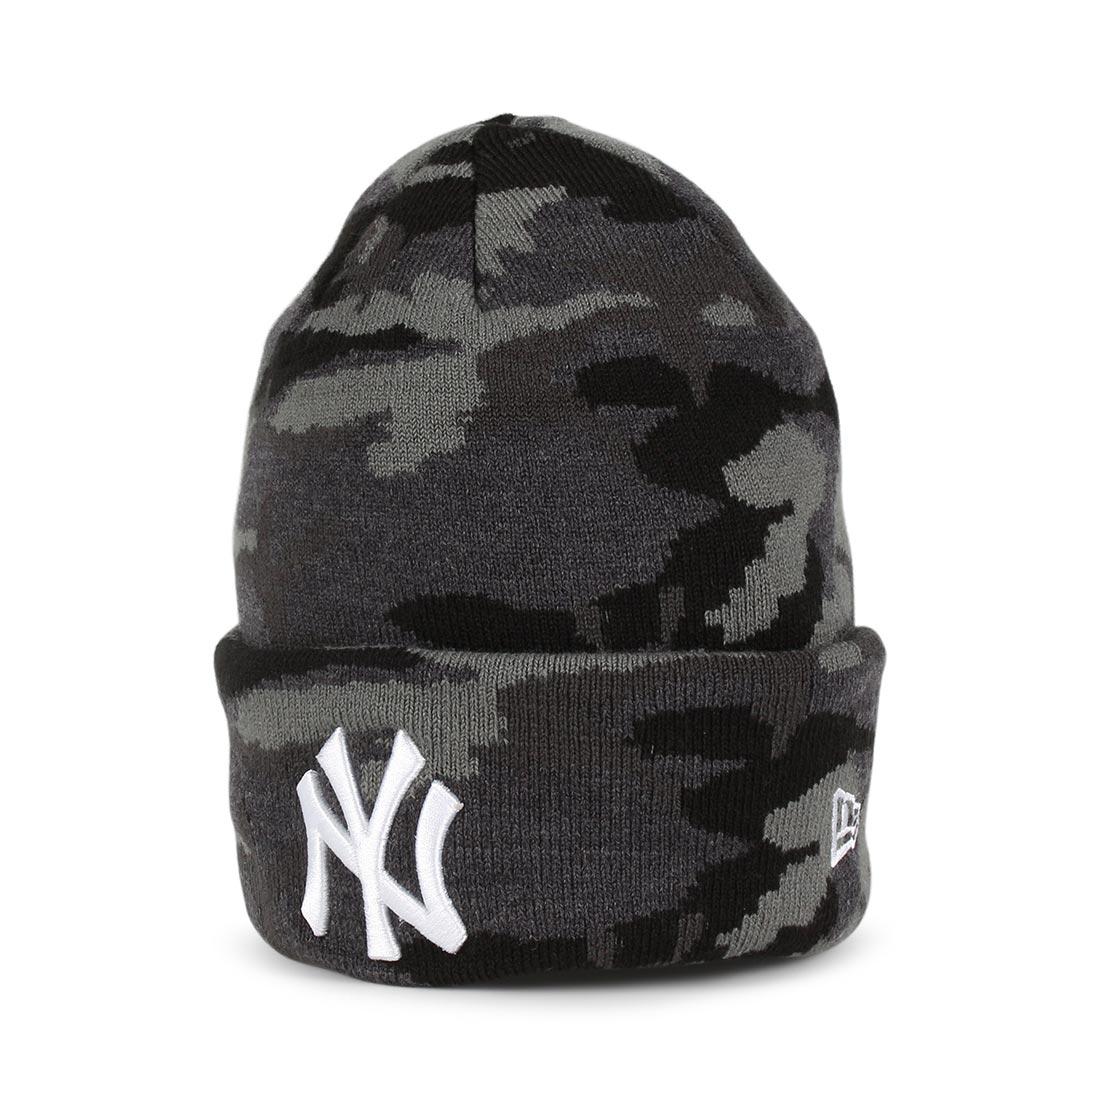 dd31671423a New Era NY Yankees Essential Knit Beanie - Midnight Camo   Optic White